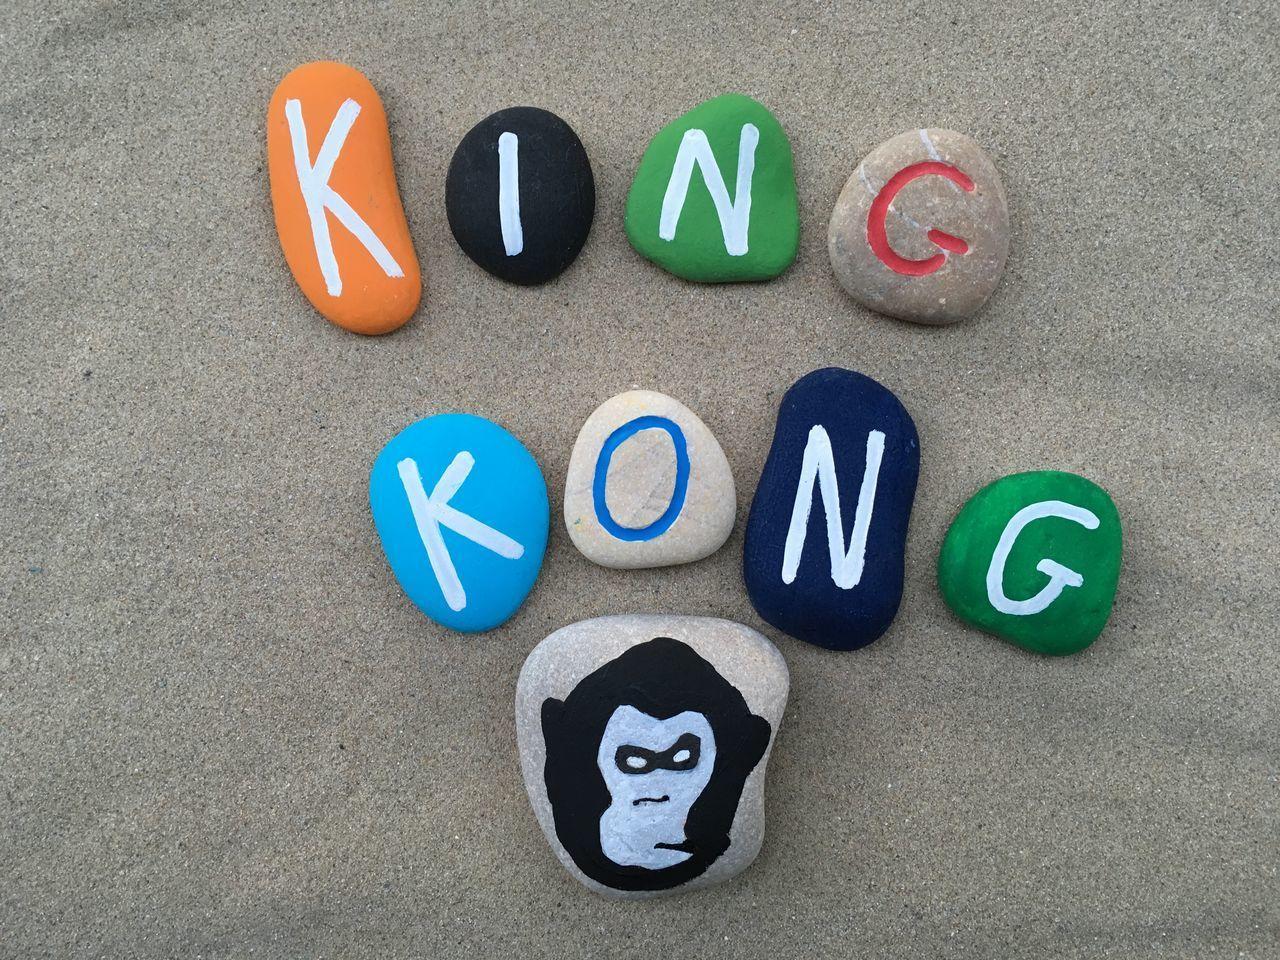 King Kong concept King Kong Idea Concept Stones Stone Art Art Artistic Symbol HERO Childhood